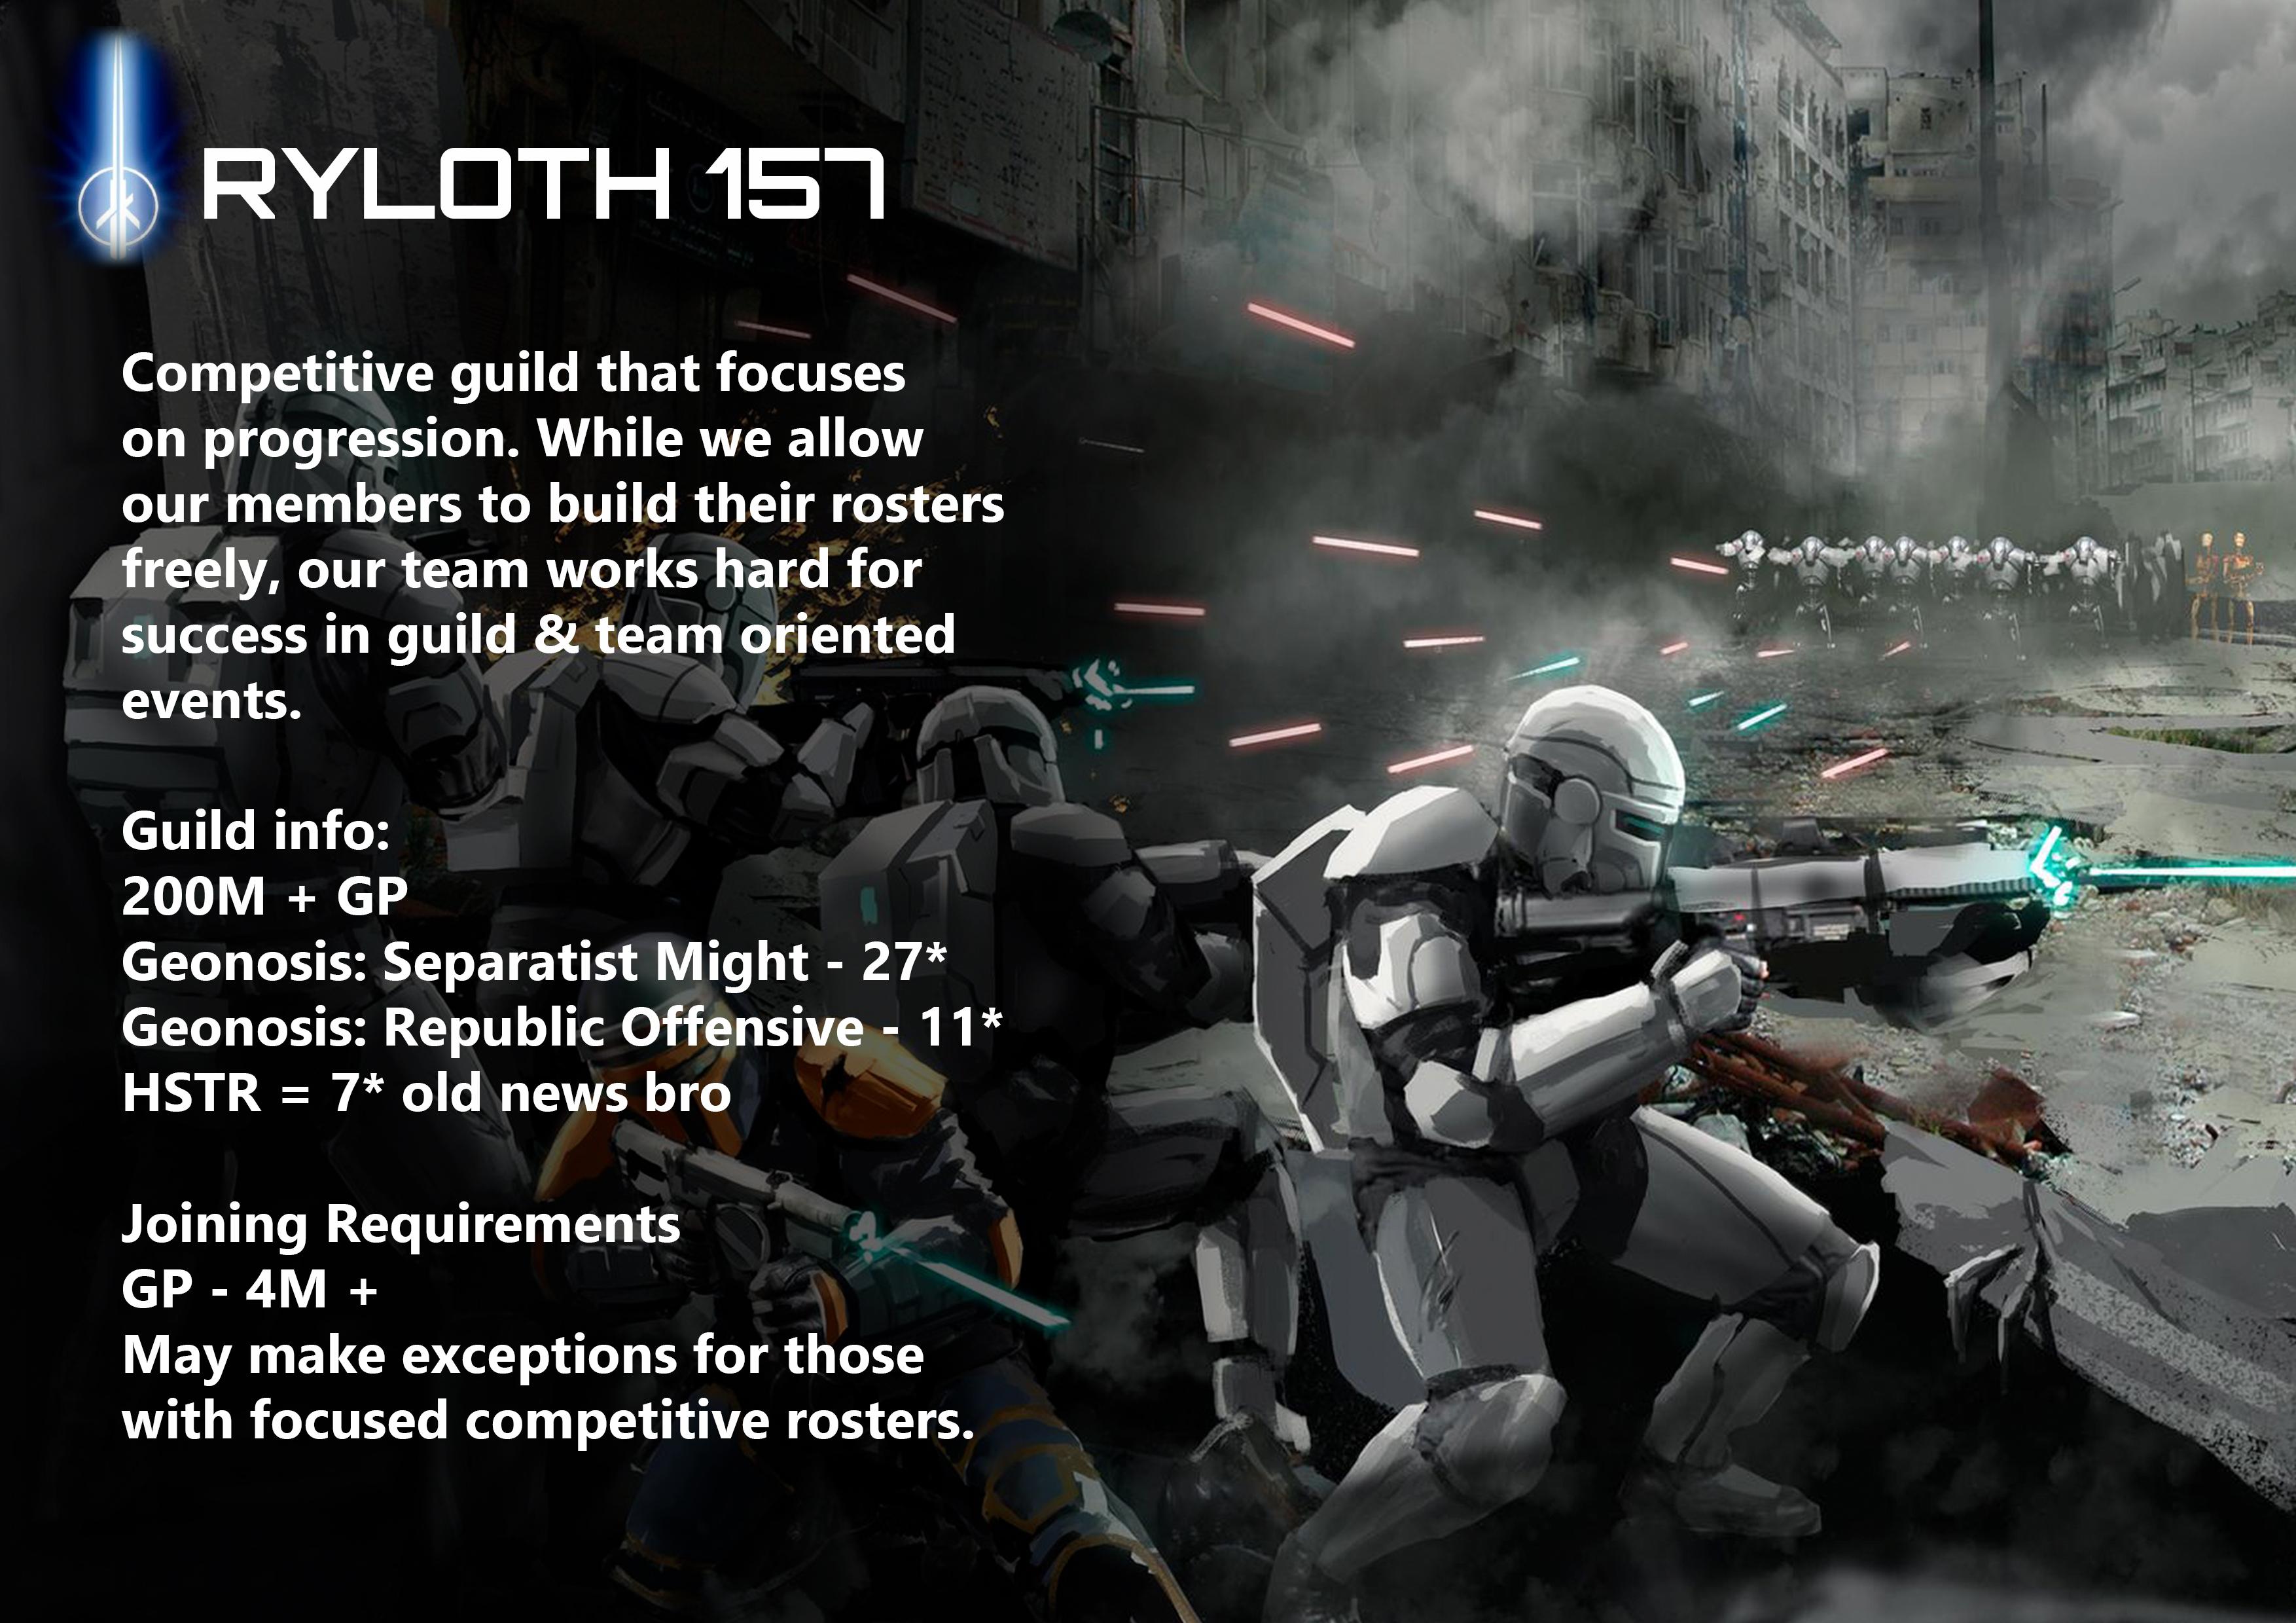 Recruitment_poster.jpg